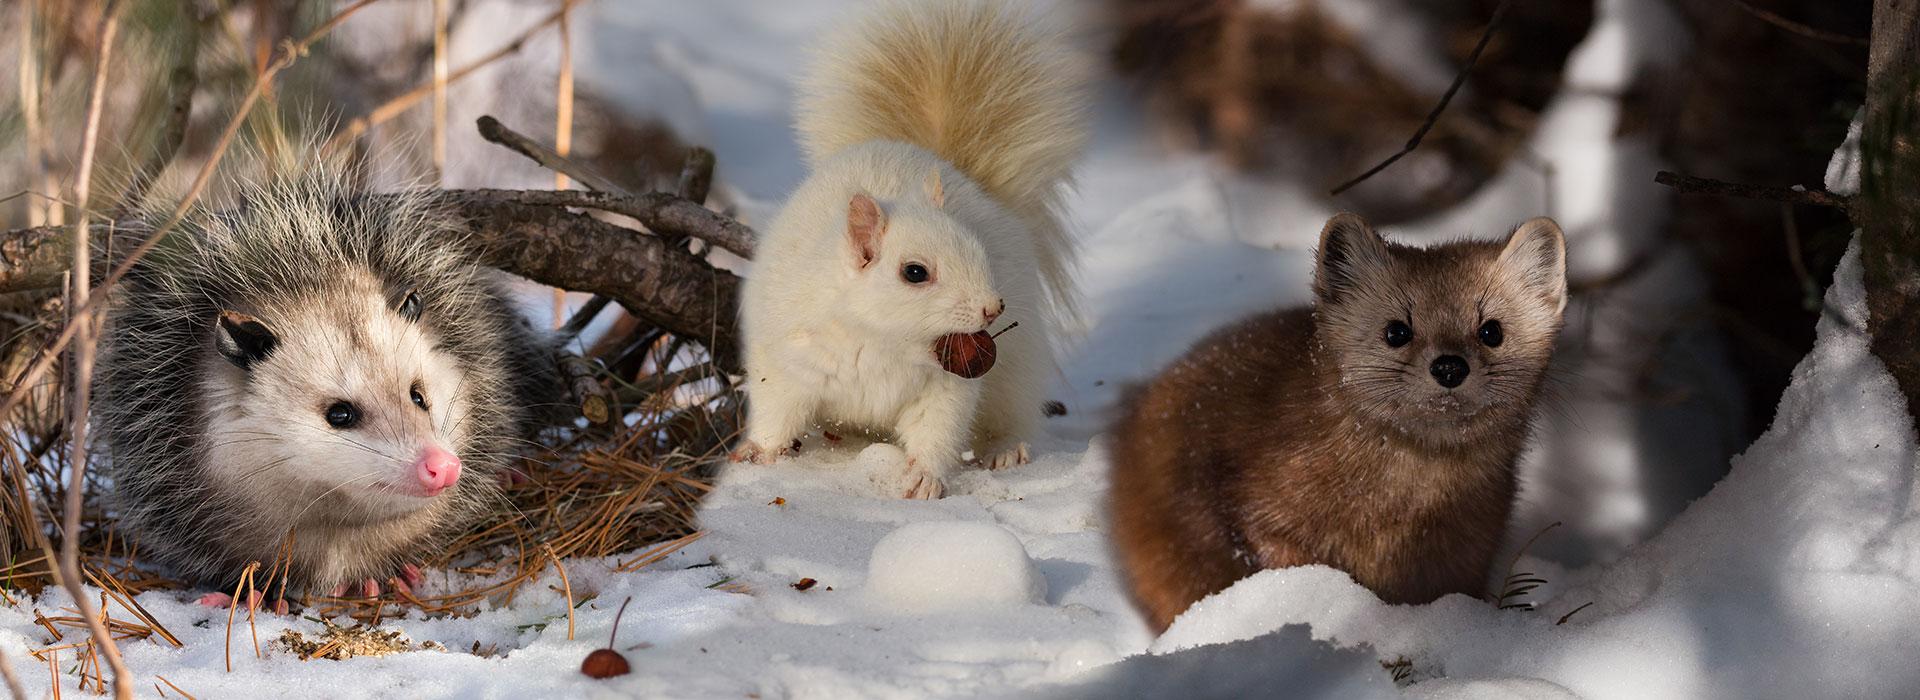 Mammals Photo Gallery